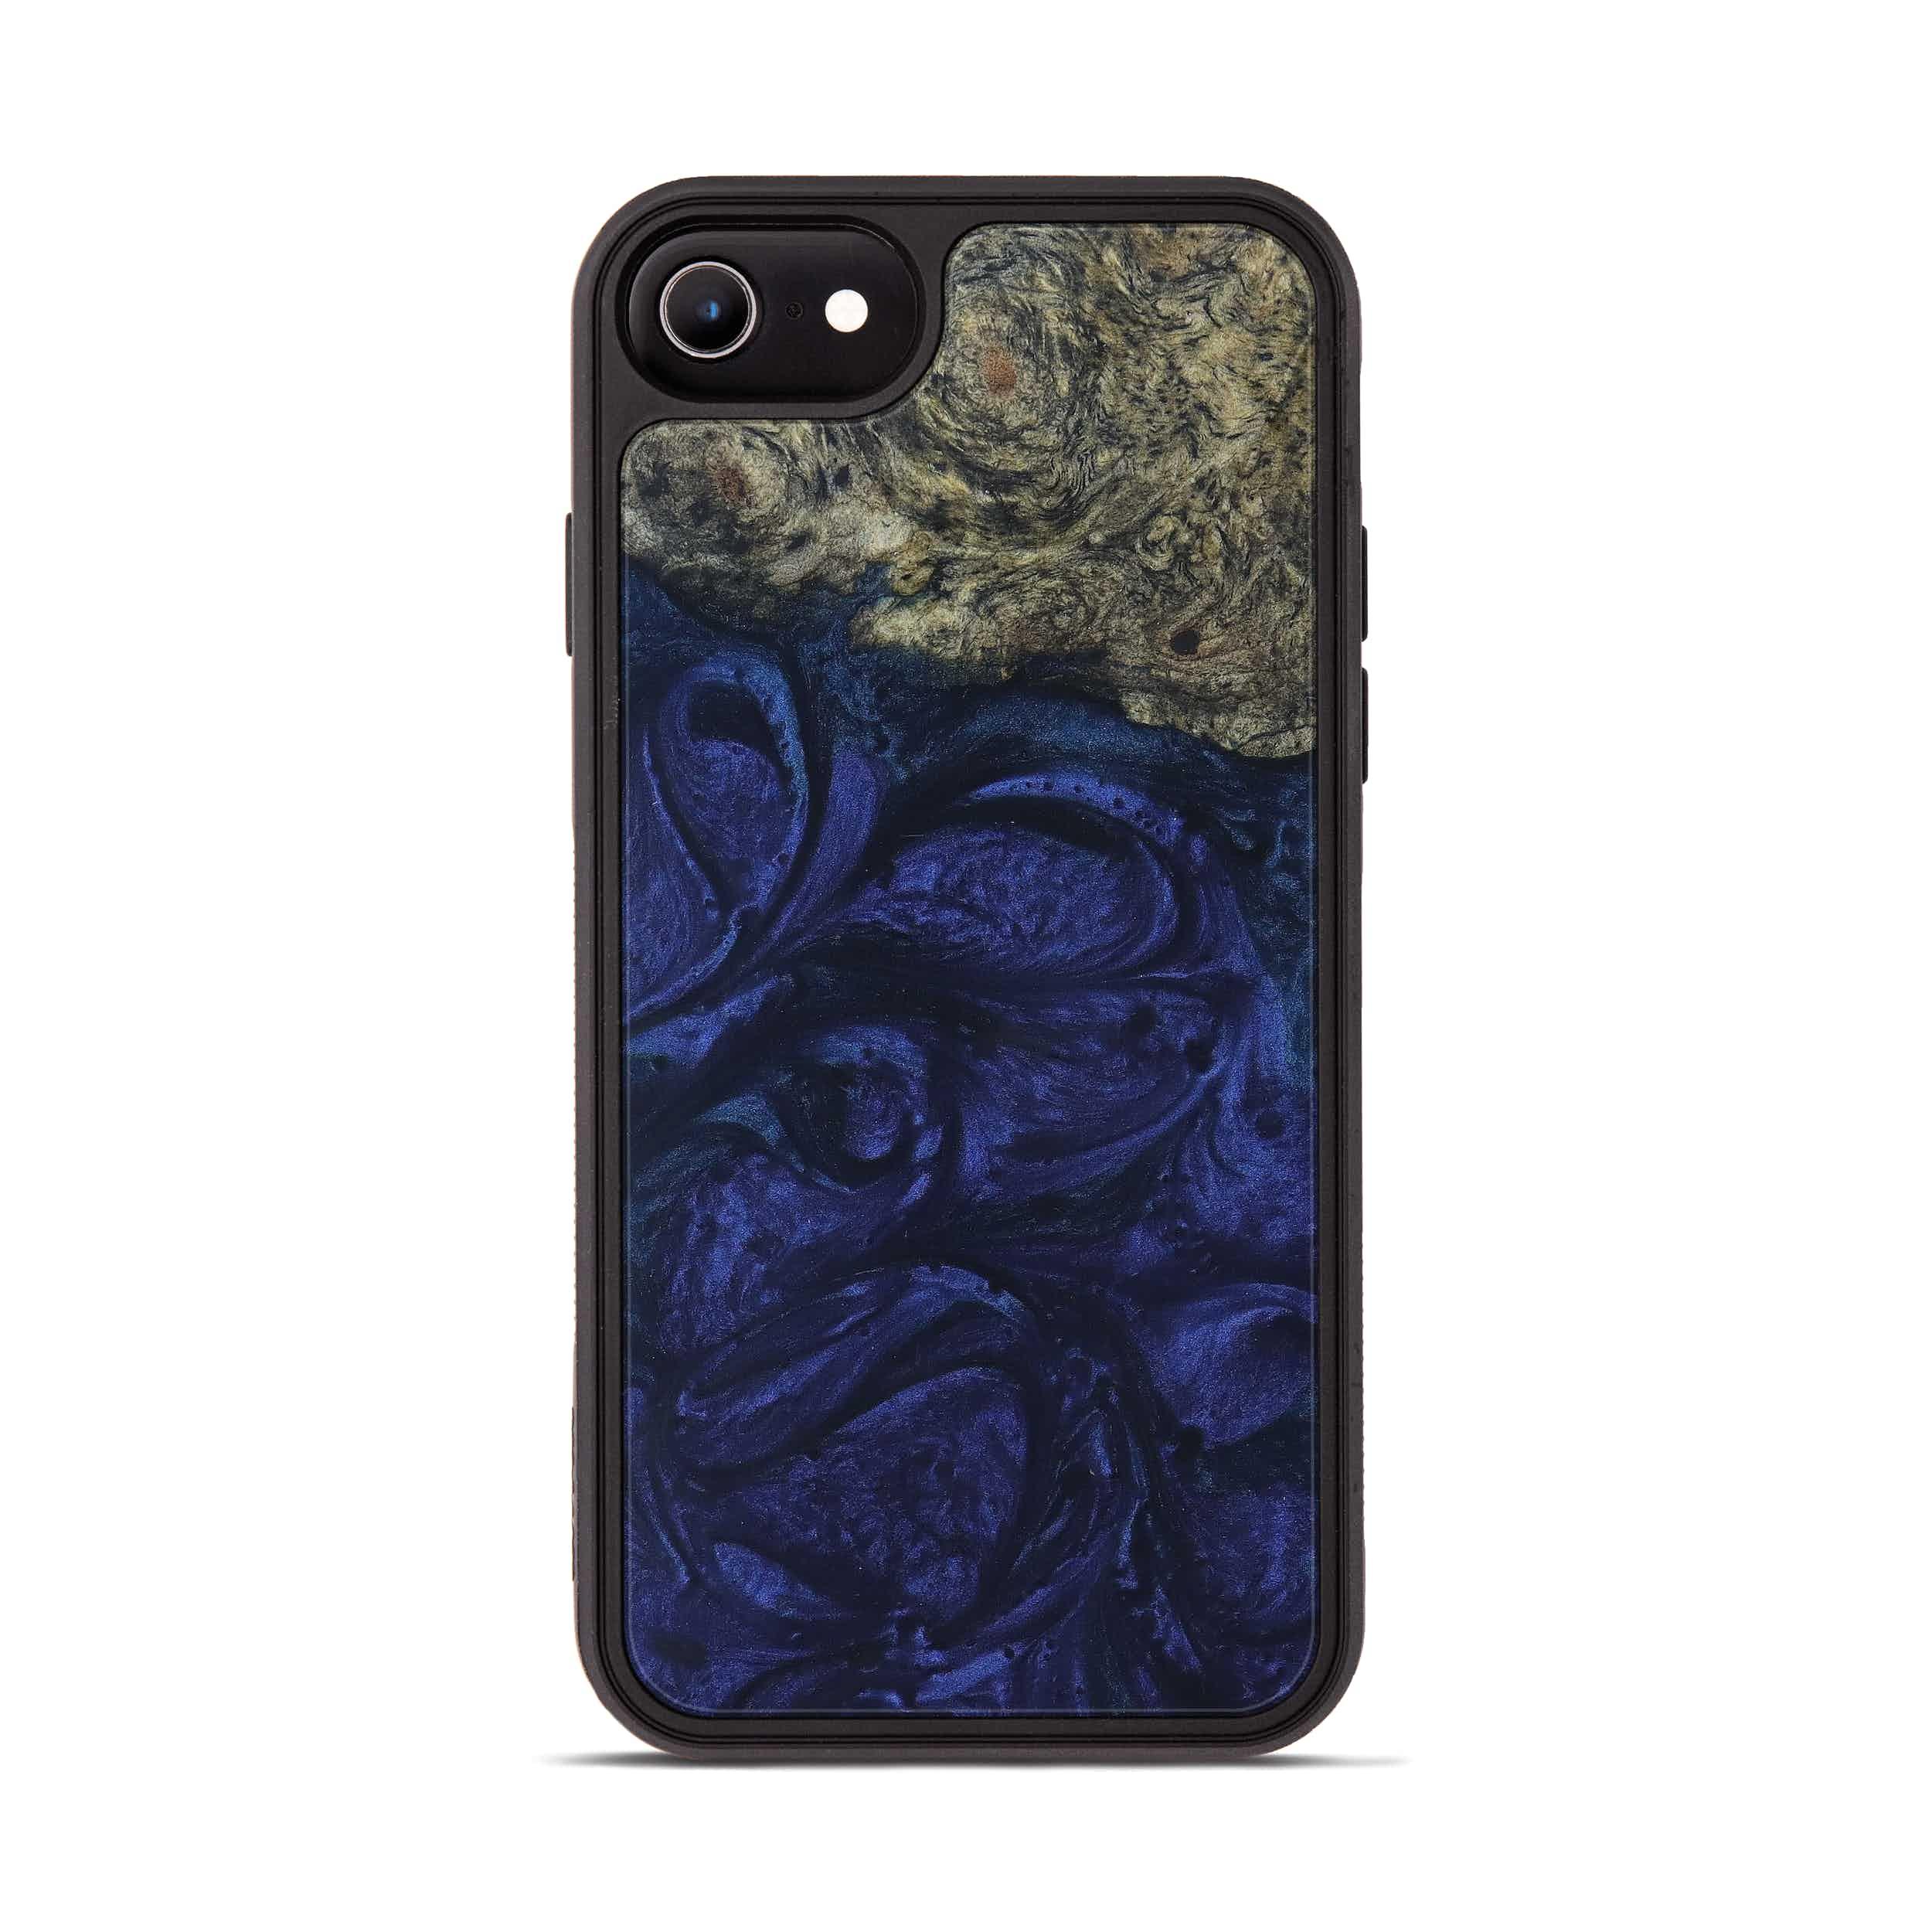 iPhone 7 Wood+Resin Phone Case - Nananne (Dark Blue, 399625)